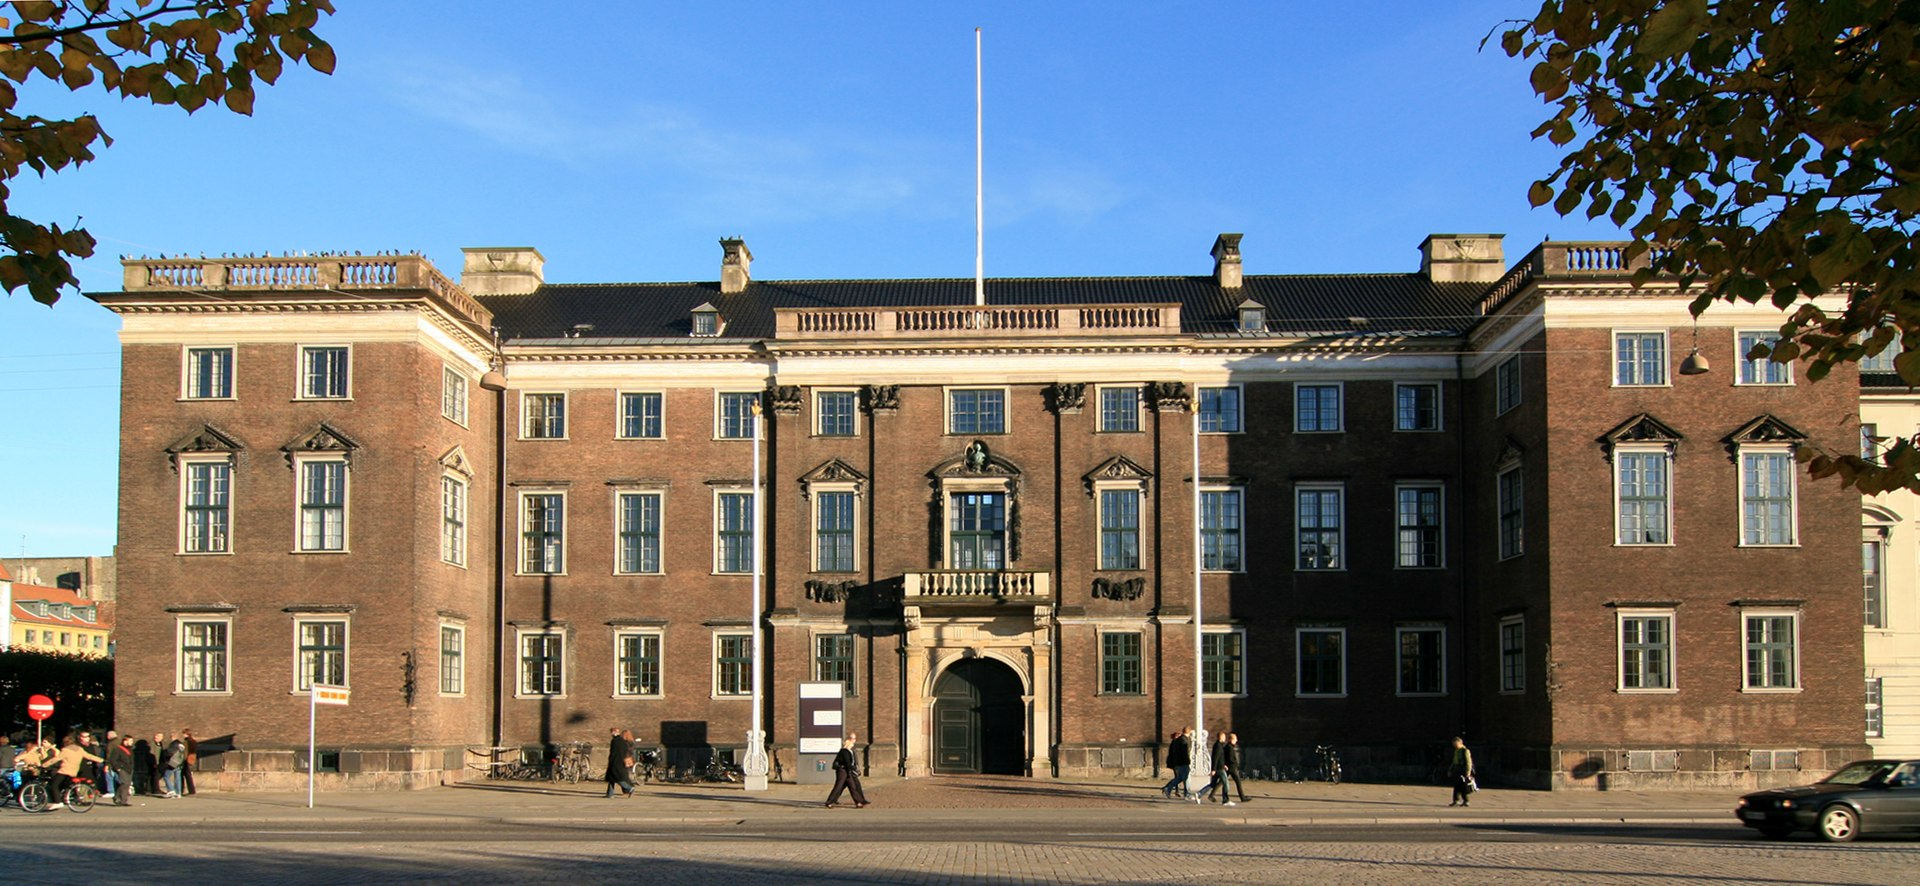 Charlottenborg København.jpg